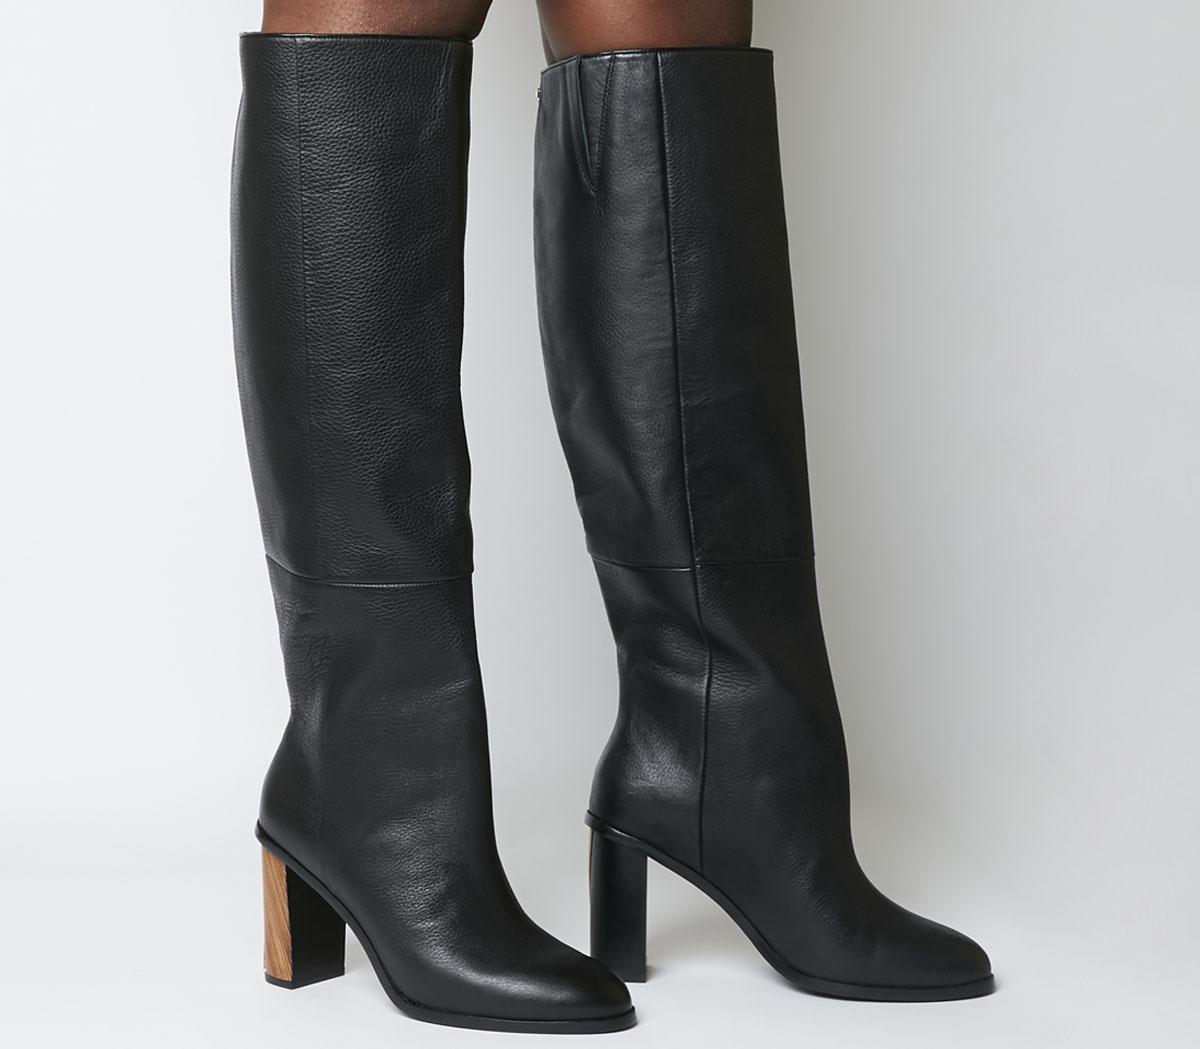 Dolarel Knee High Boots